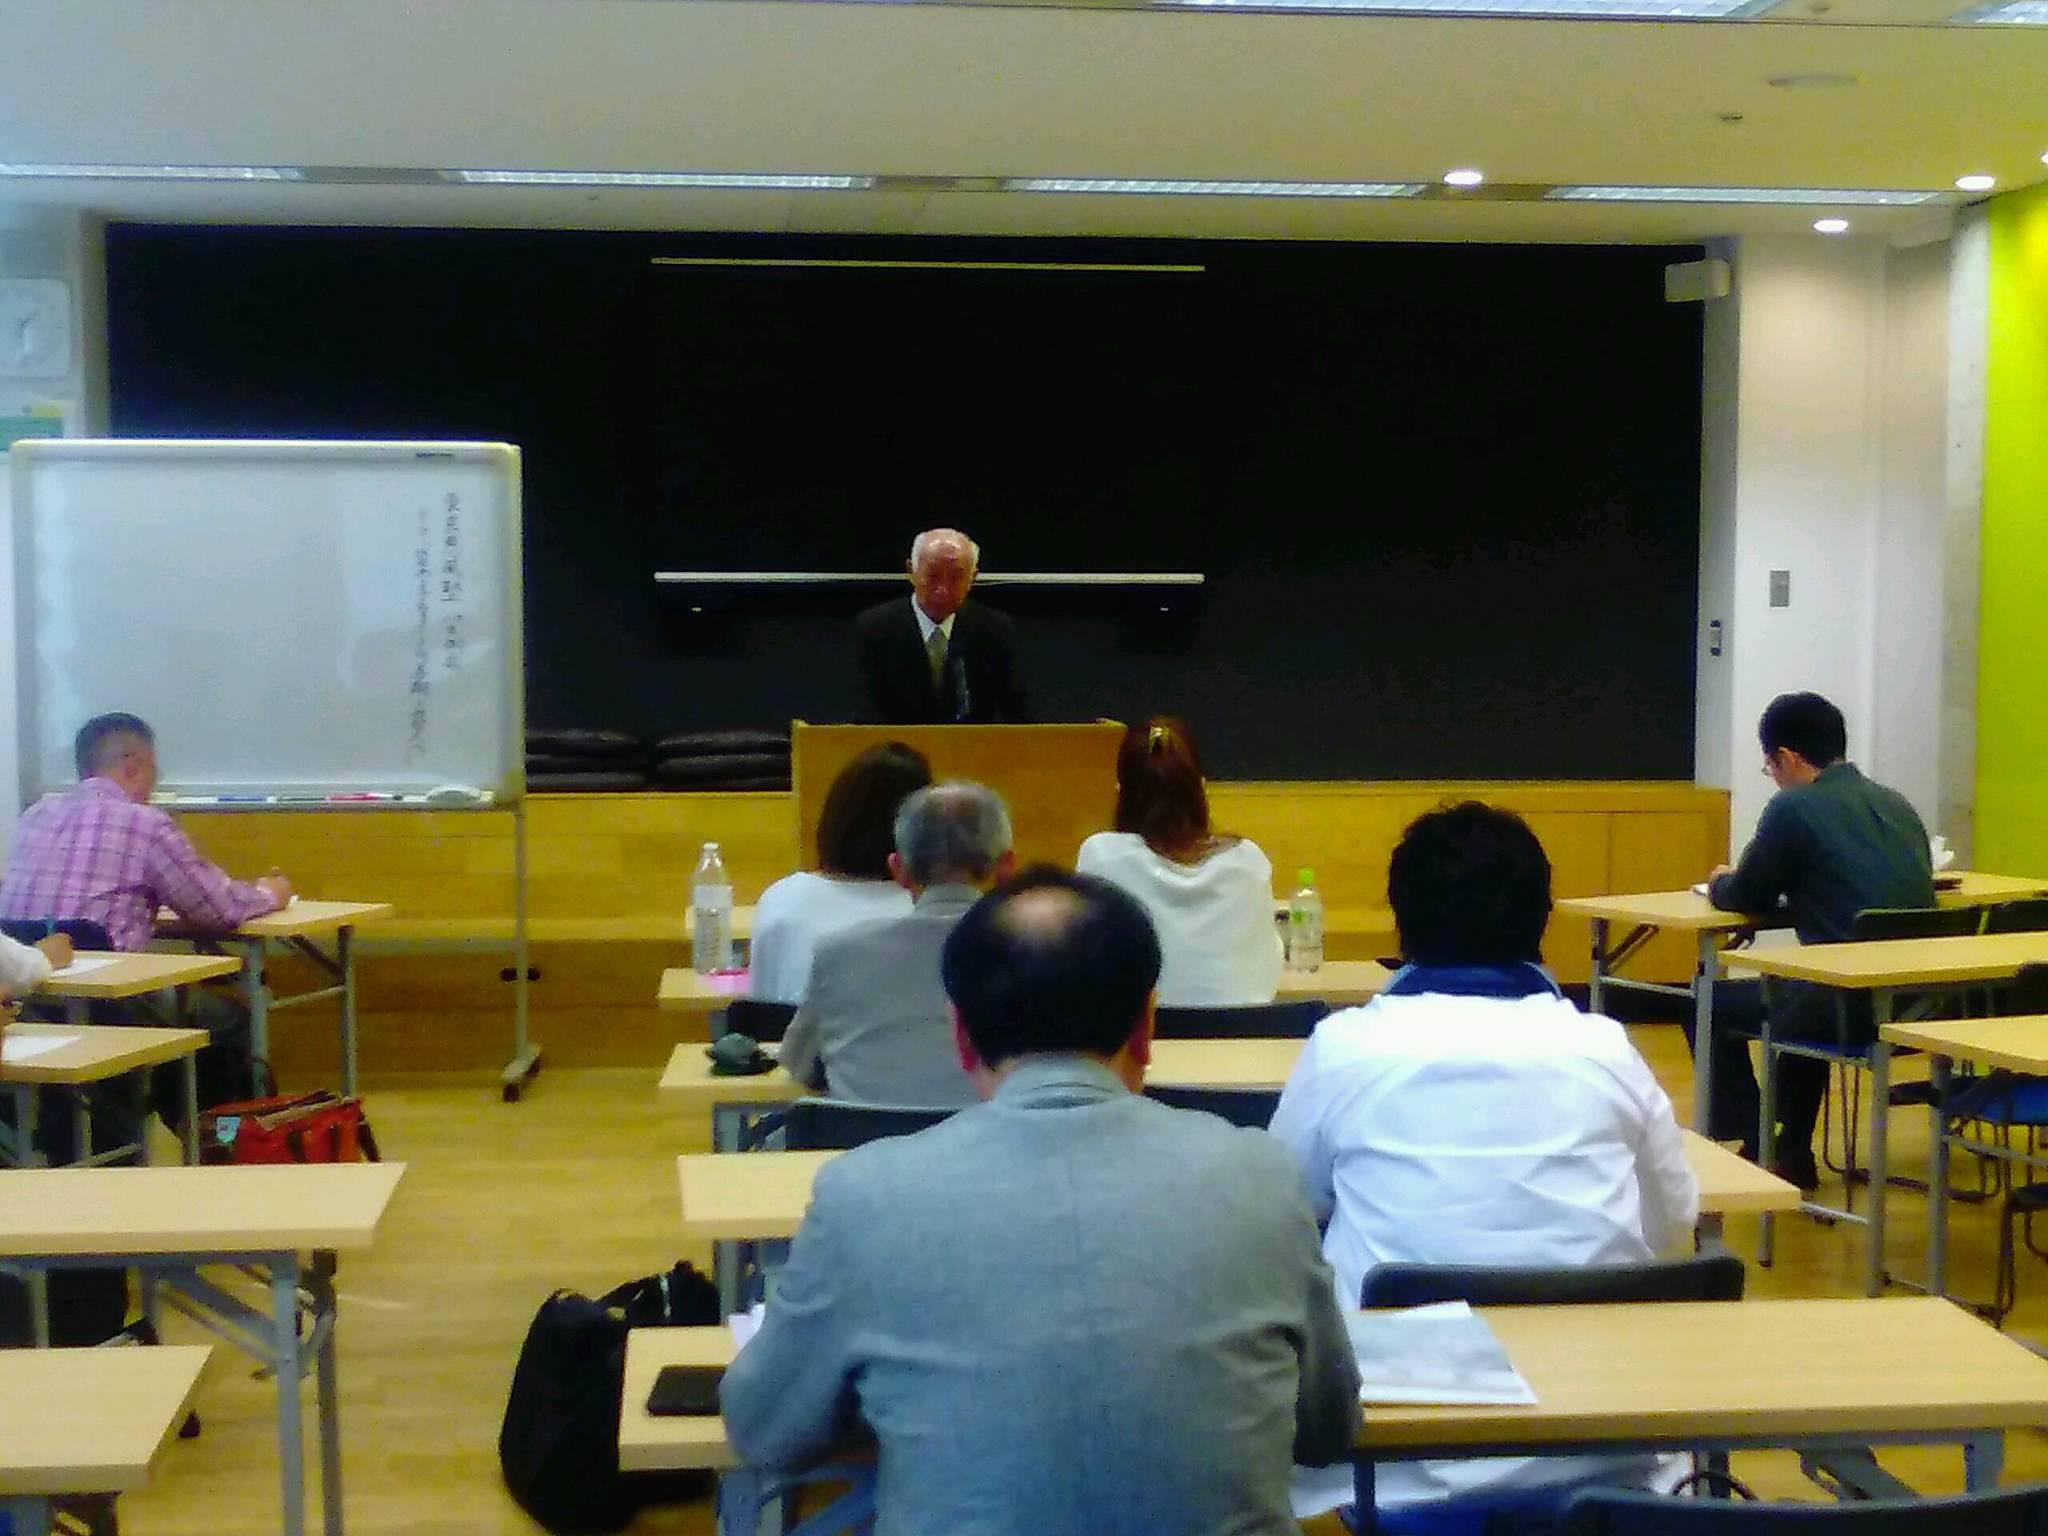 22323818 1939370022816338 602958590 o - 4月1日東京思風塾の開催になります。